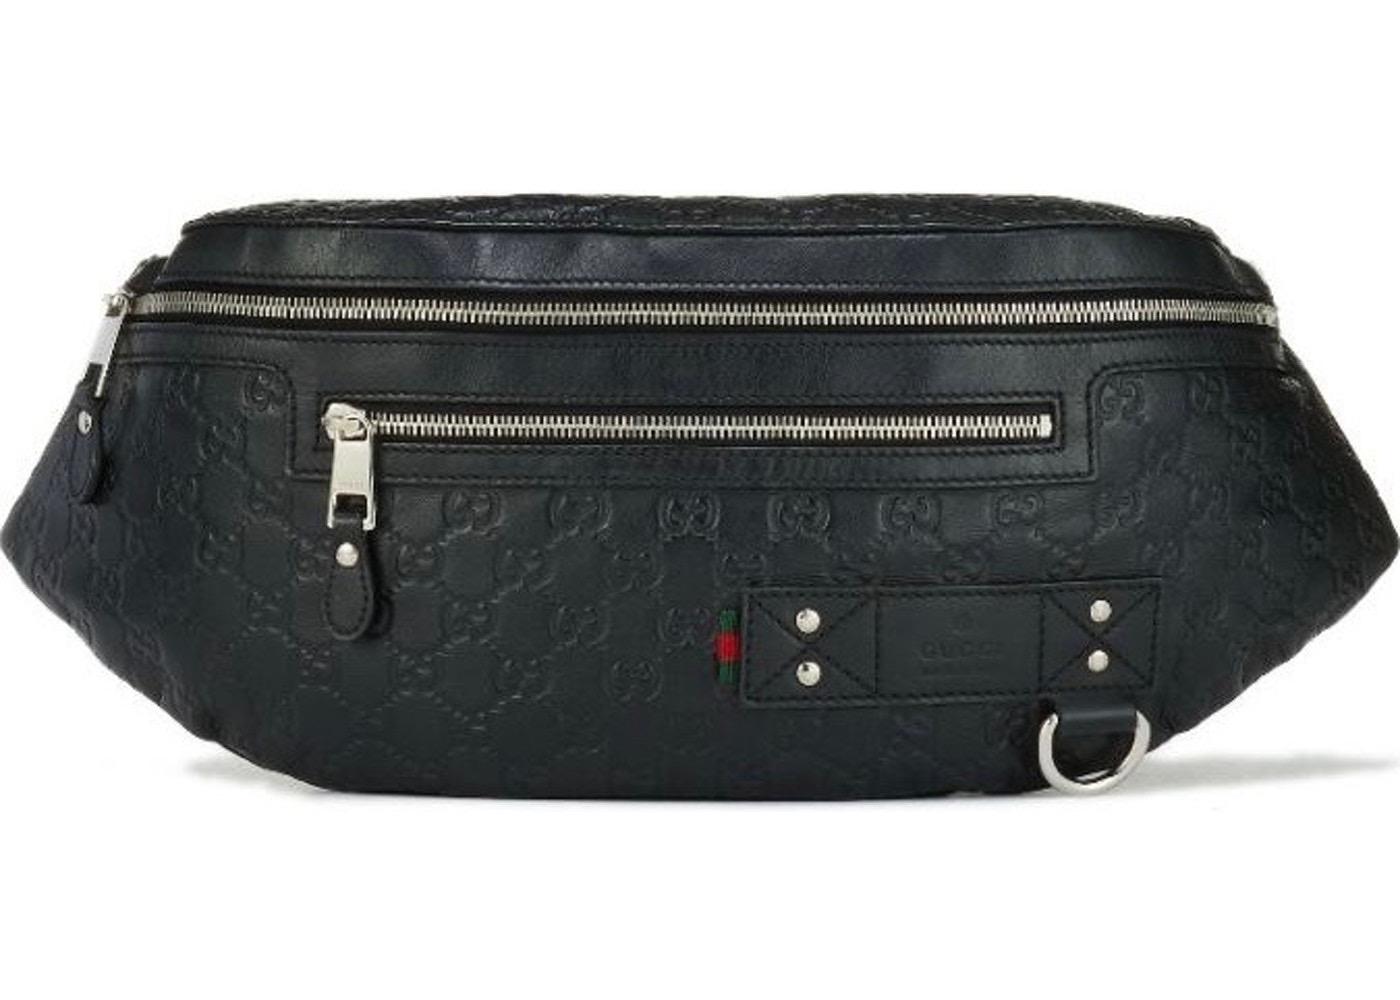 d8345833476e52 Gucci Gucci pouch waist bag Guccissima Black Size one size - Bags ...